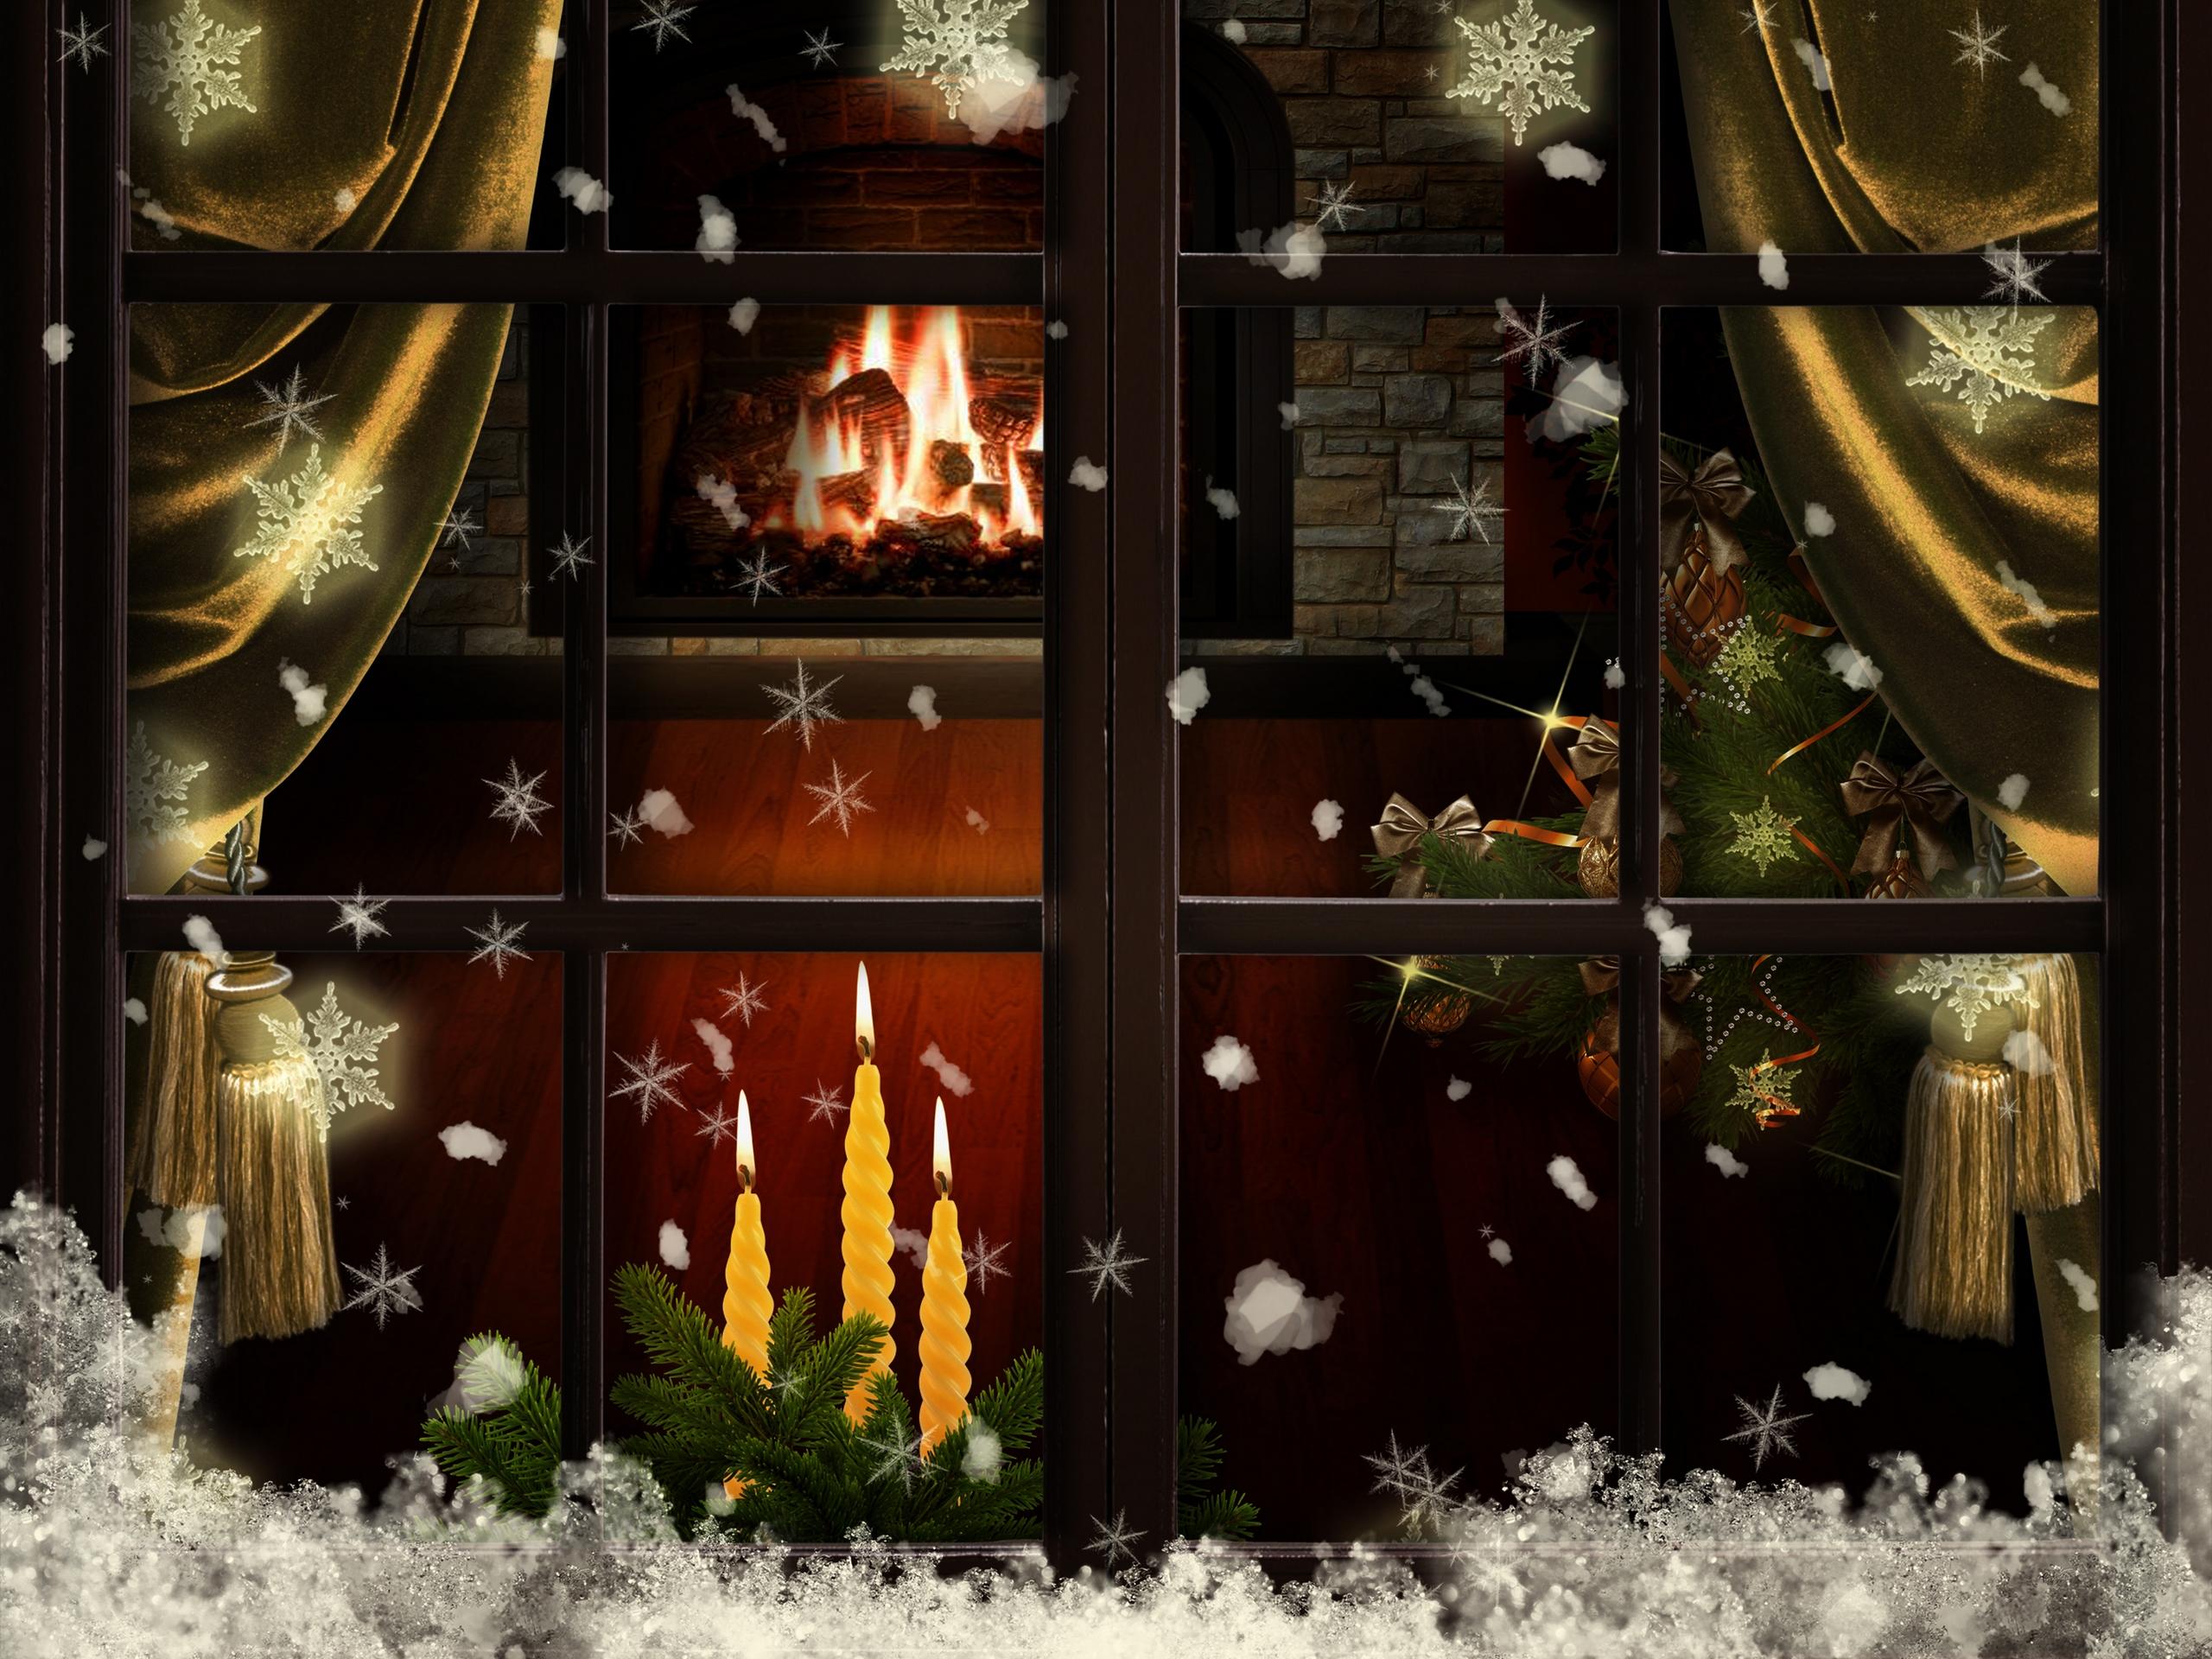 Сапоги новый год окно Boots new year window  № 2639411 бесплатно